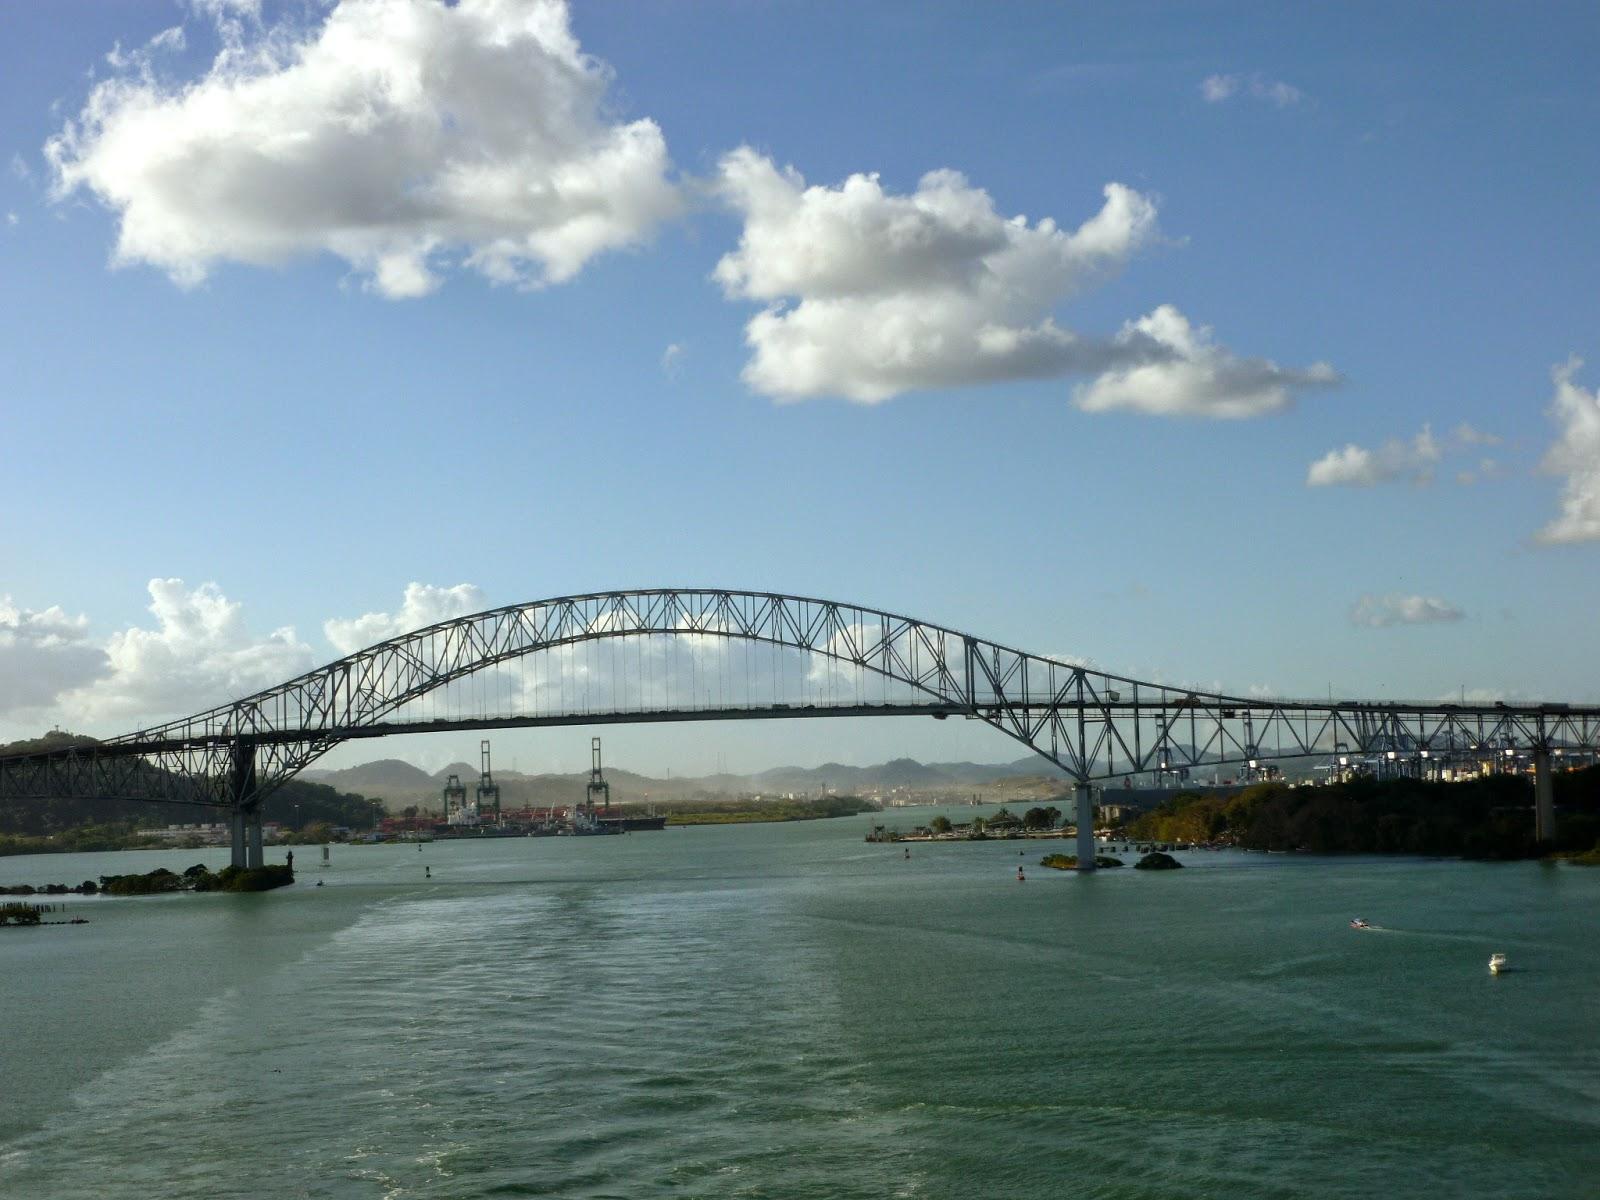 bridge of the americas Punte de las americas - the bridge of the americas crosses the panama canal connecting panama city with the panamerican highway.